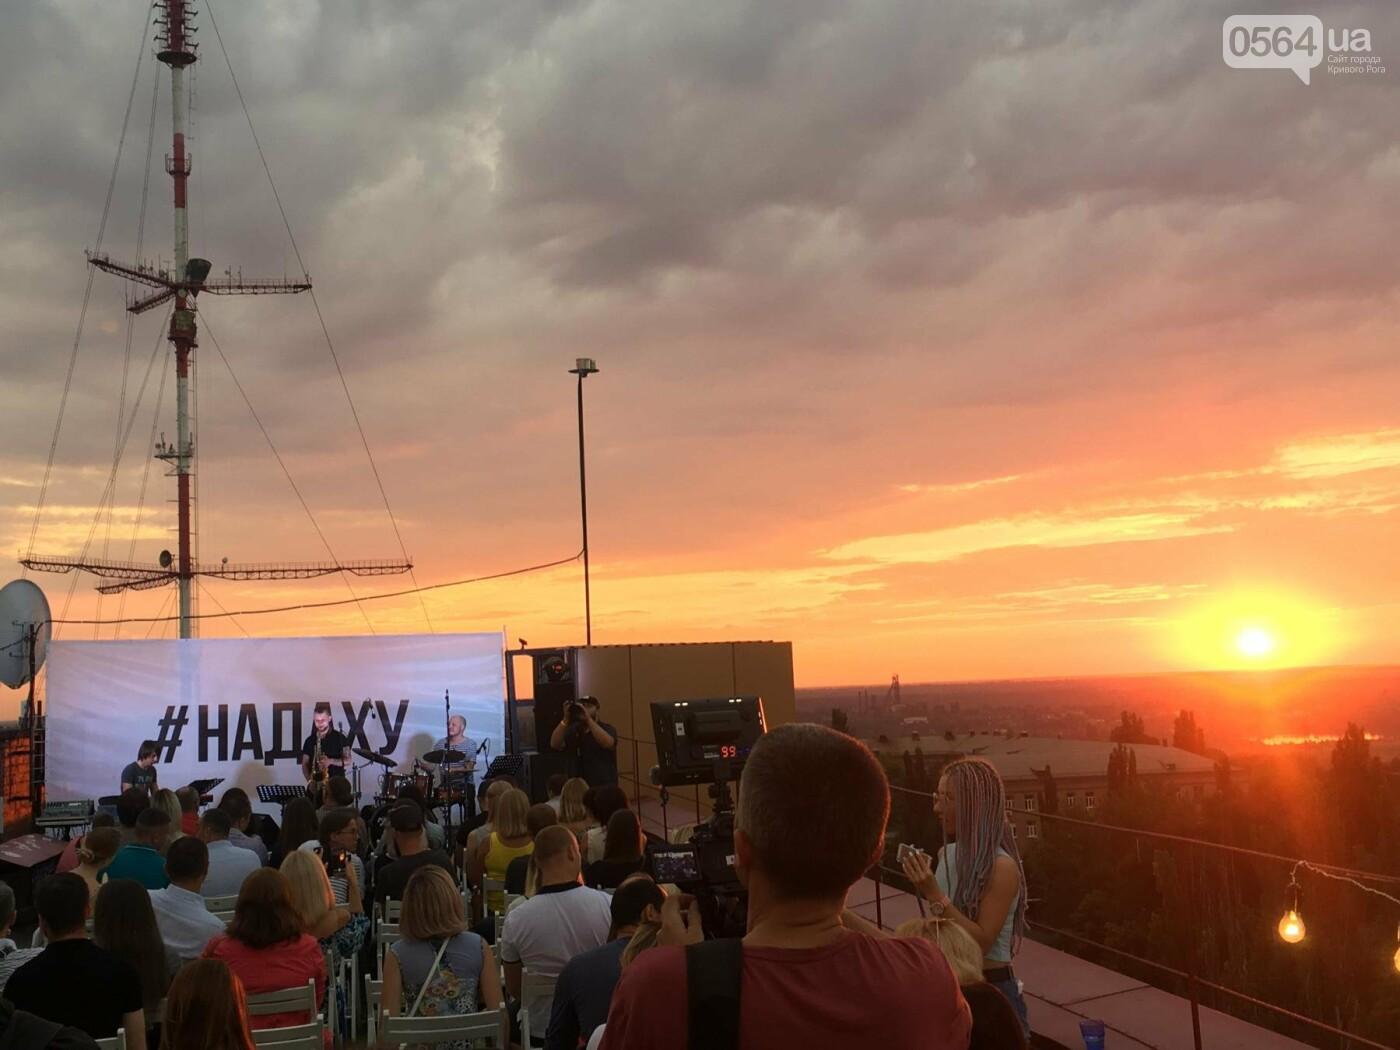 Сотни криворожан встречали закат на крыше отеля под мелодии джаза, - ФОТО, ВИДЕО, фото-19